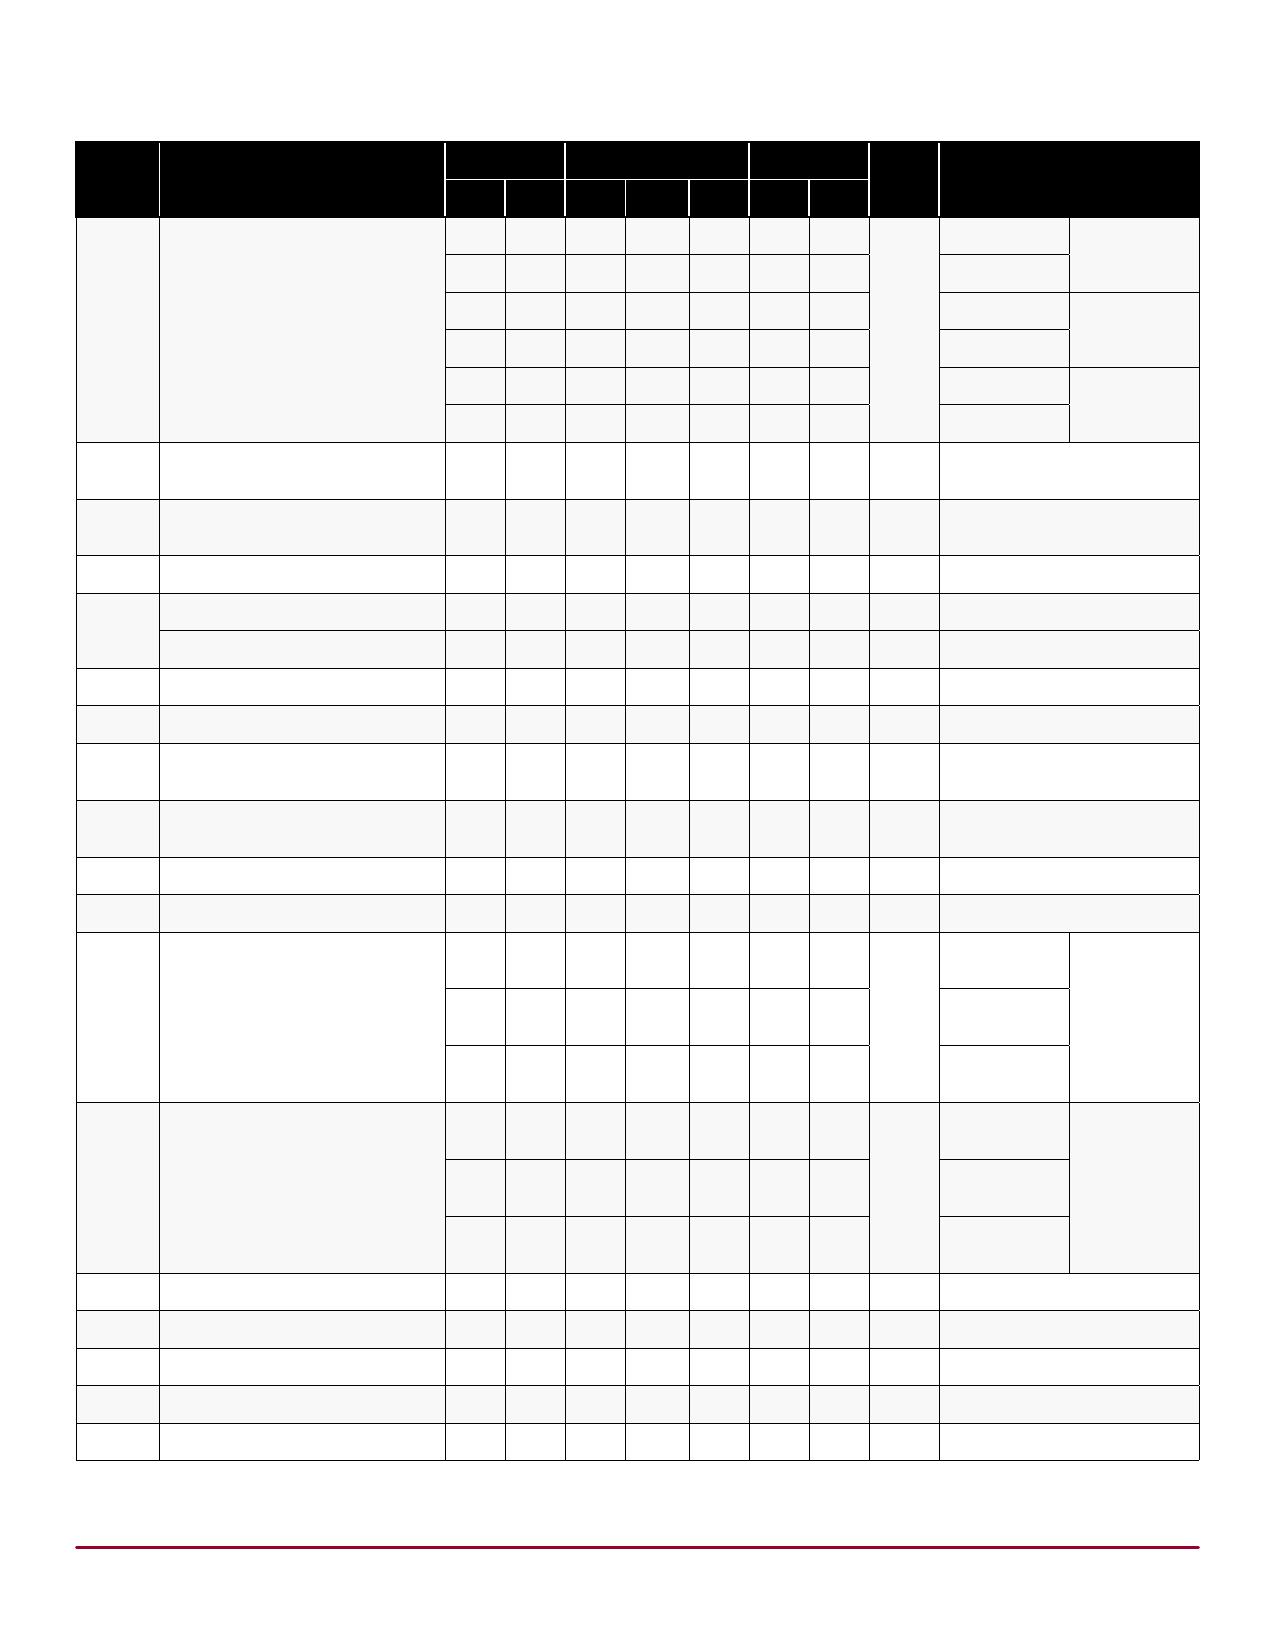 HV219 pdf, ピン配列